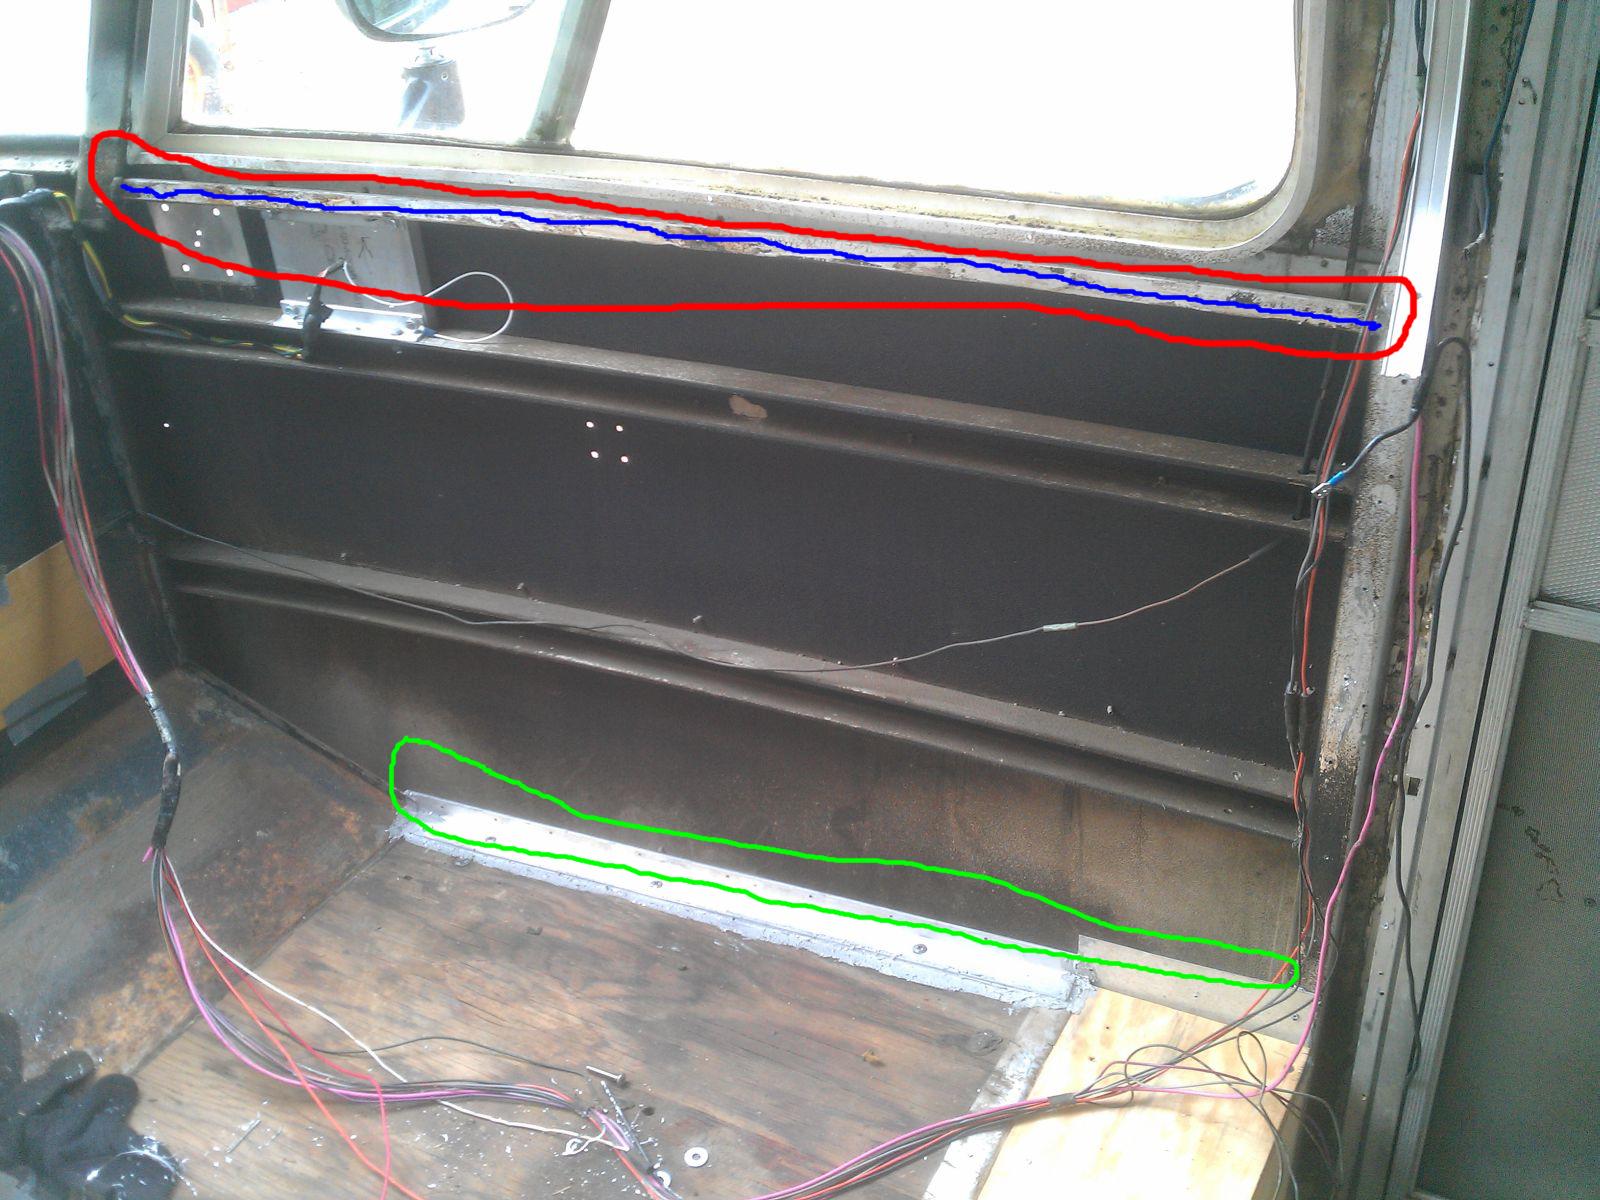 Click image for larger version  Name:74-argosy-rh-cockpit-inner-framework.jpg Views:114 Size:1.14 MB ID:194655